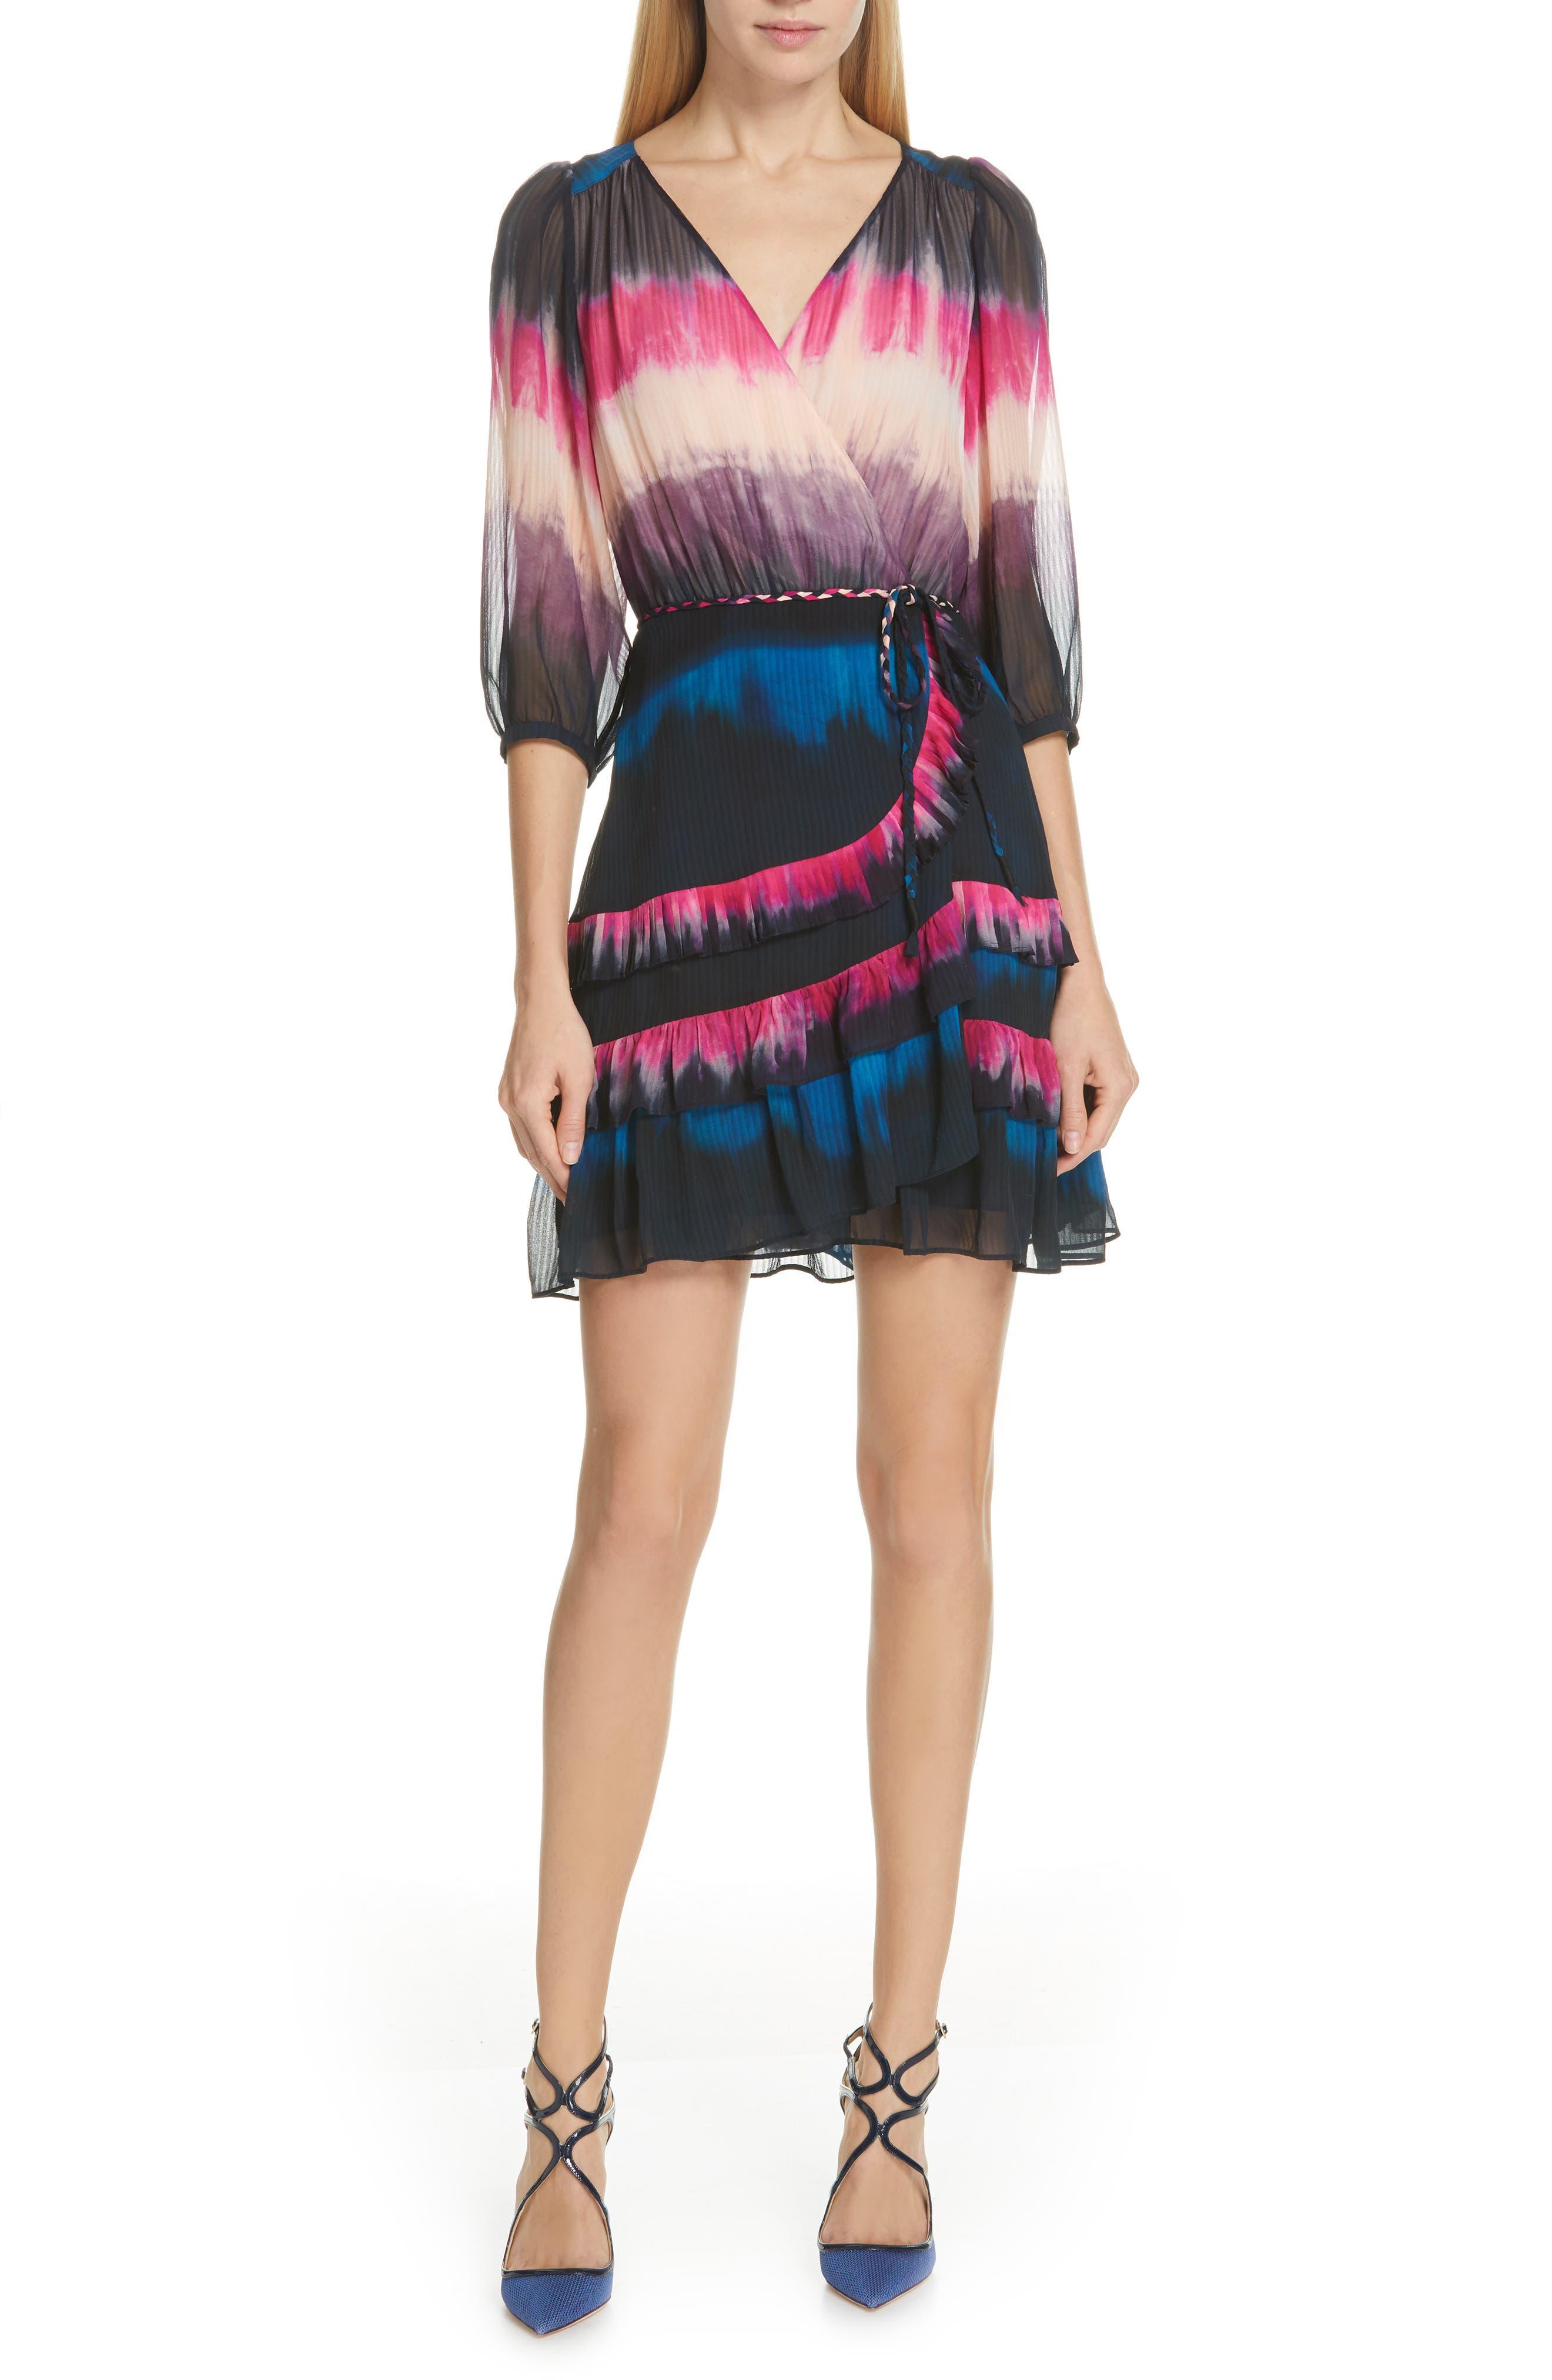 TANYA TAYLOR Valeria Tie Dye Silk Faux Wrap Dress, Main, color, TIE DYE STRIPE